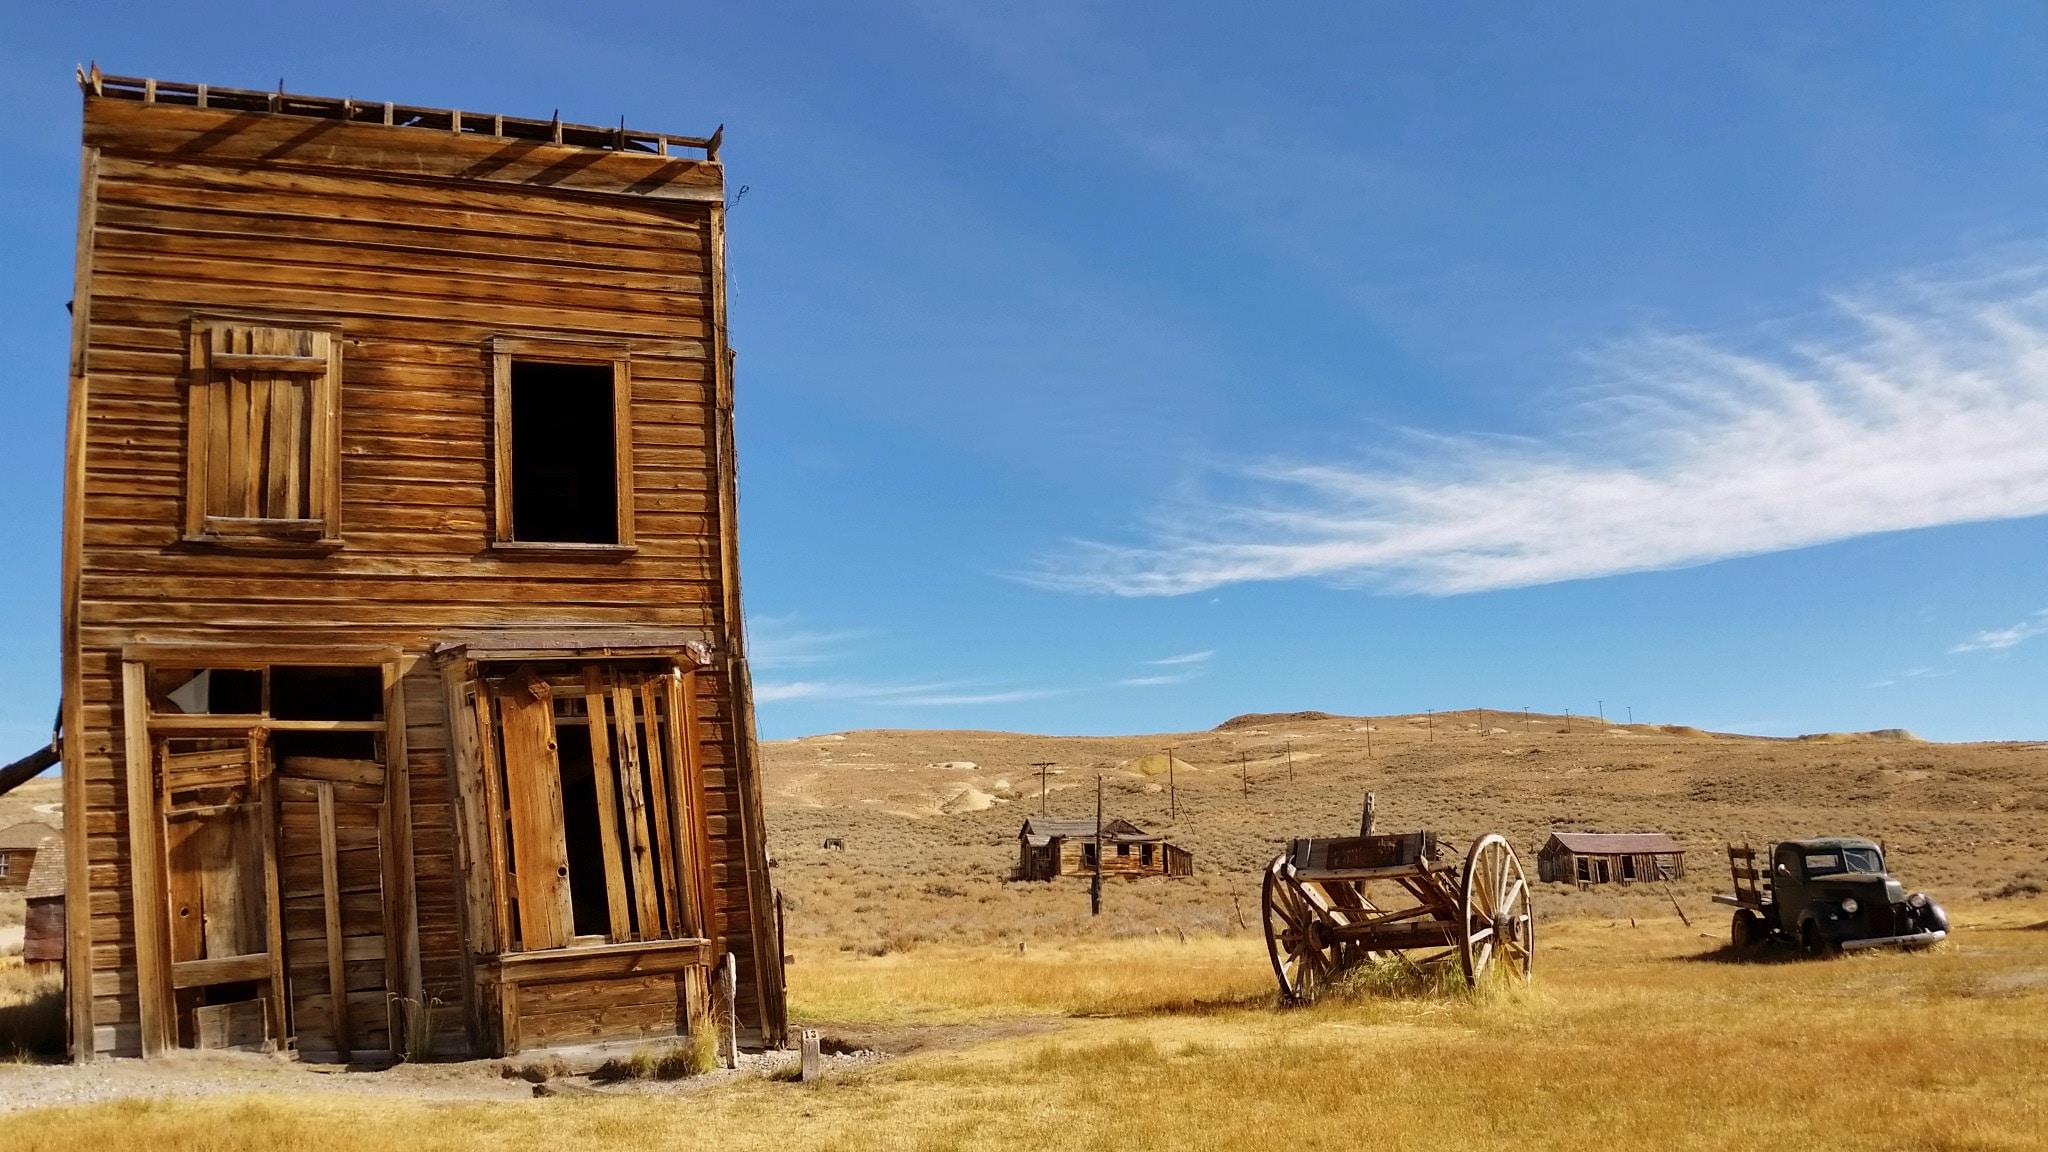 Deserted wild west shack